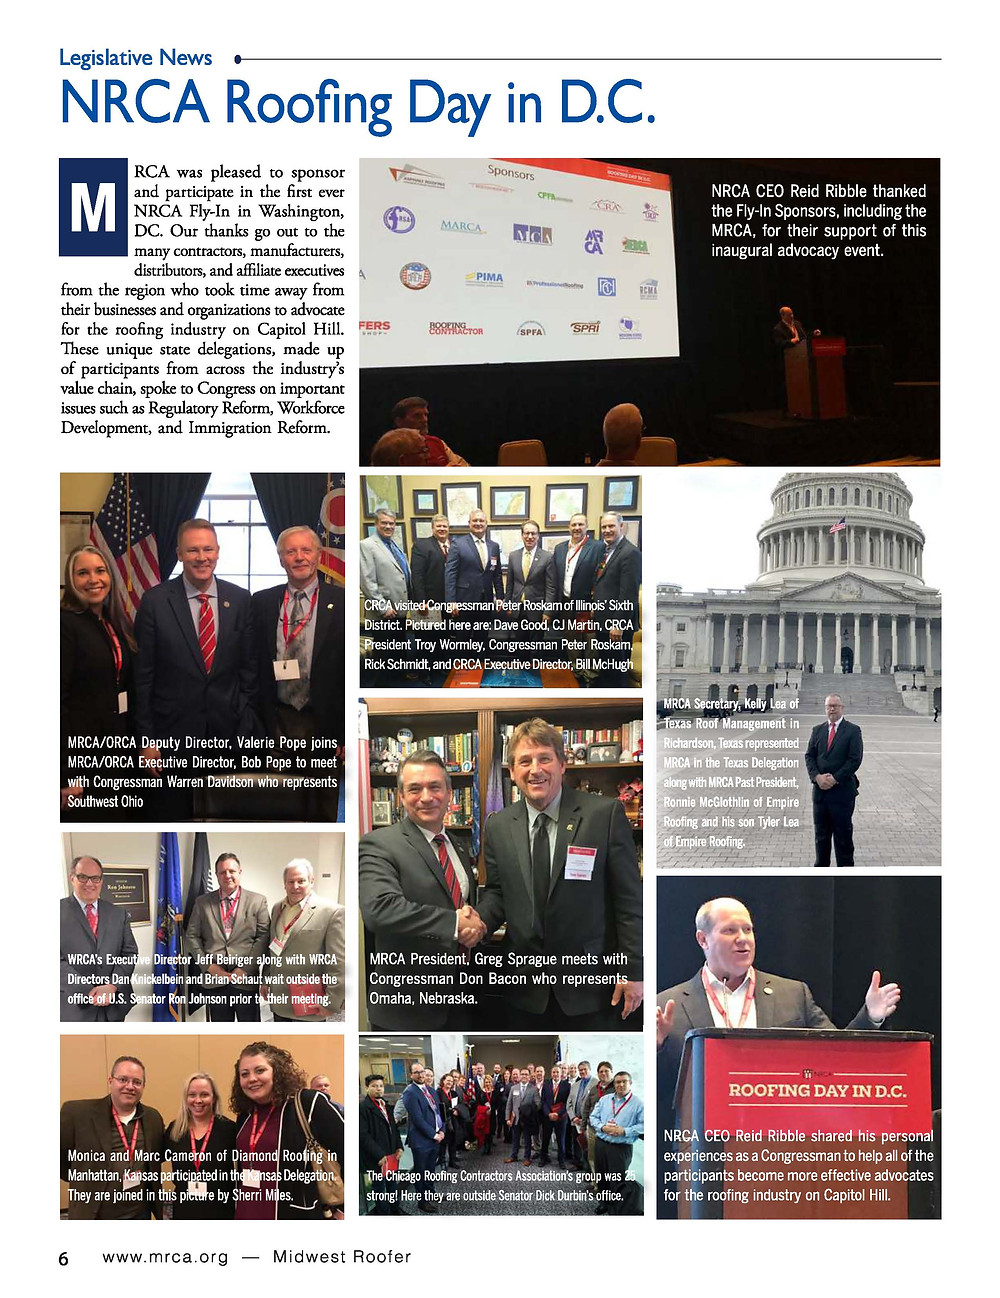 April MR Magazine Article